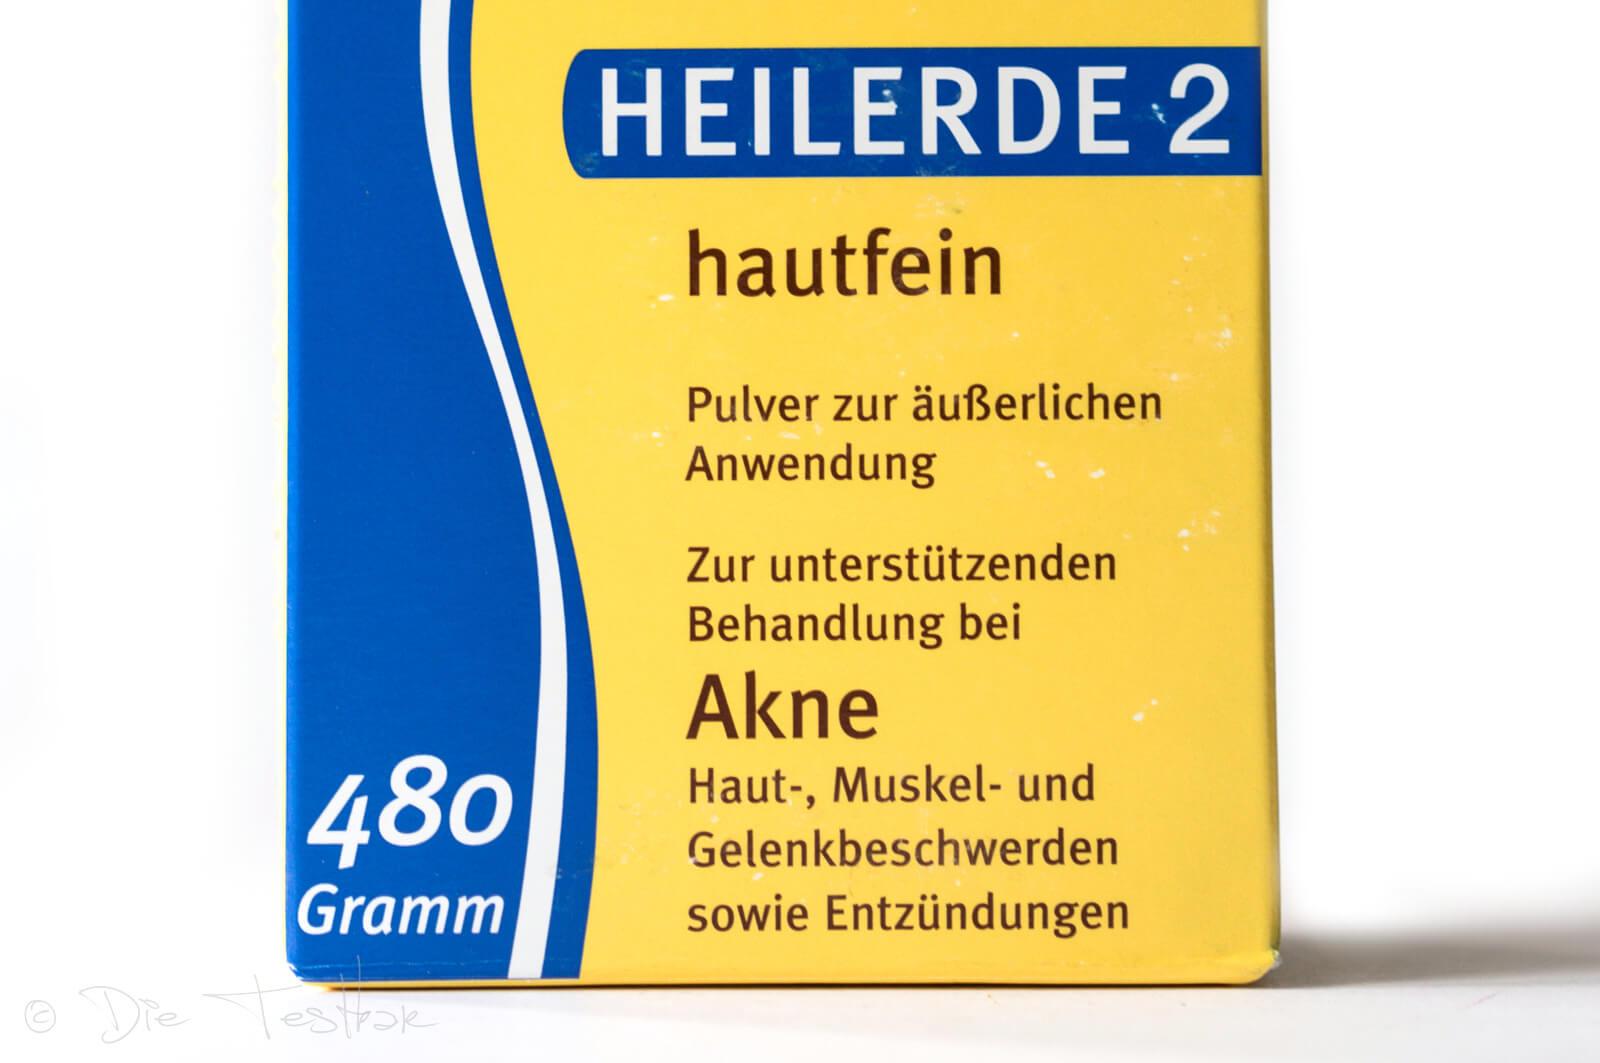 Adolf Justs Luvos-Heilerde 2 hautfein